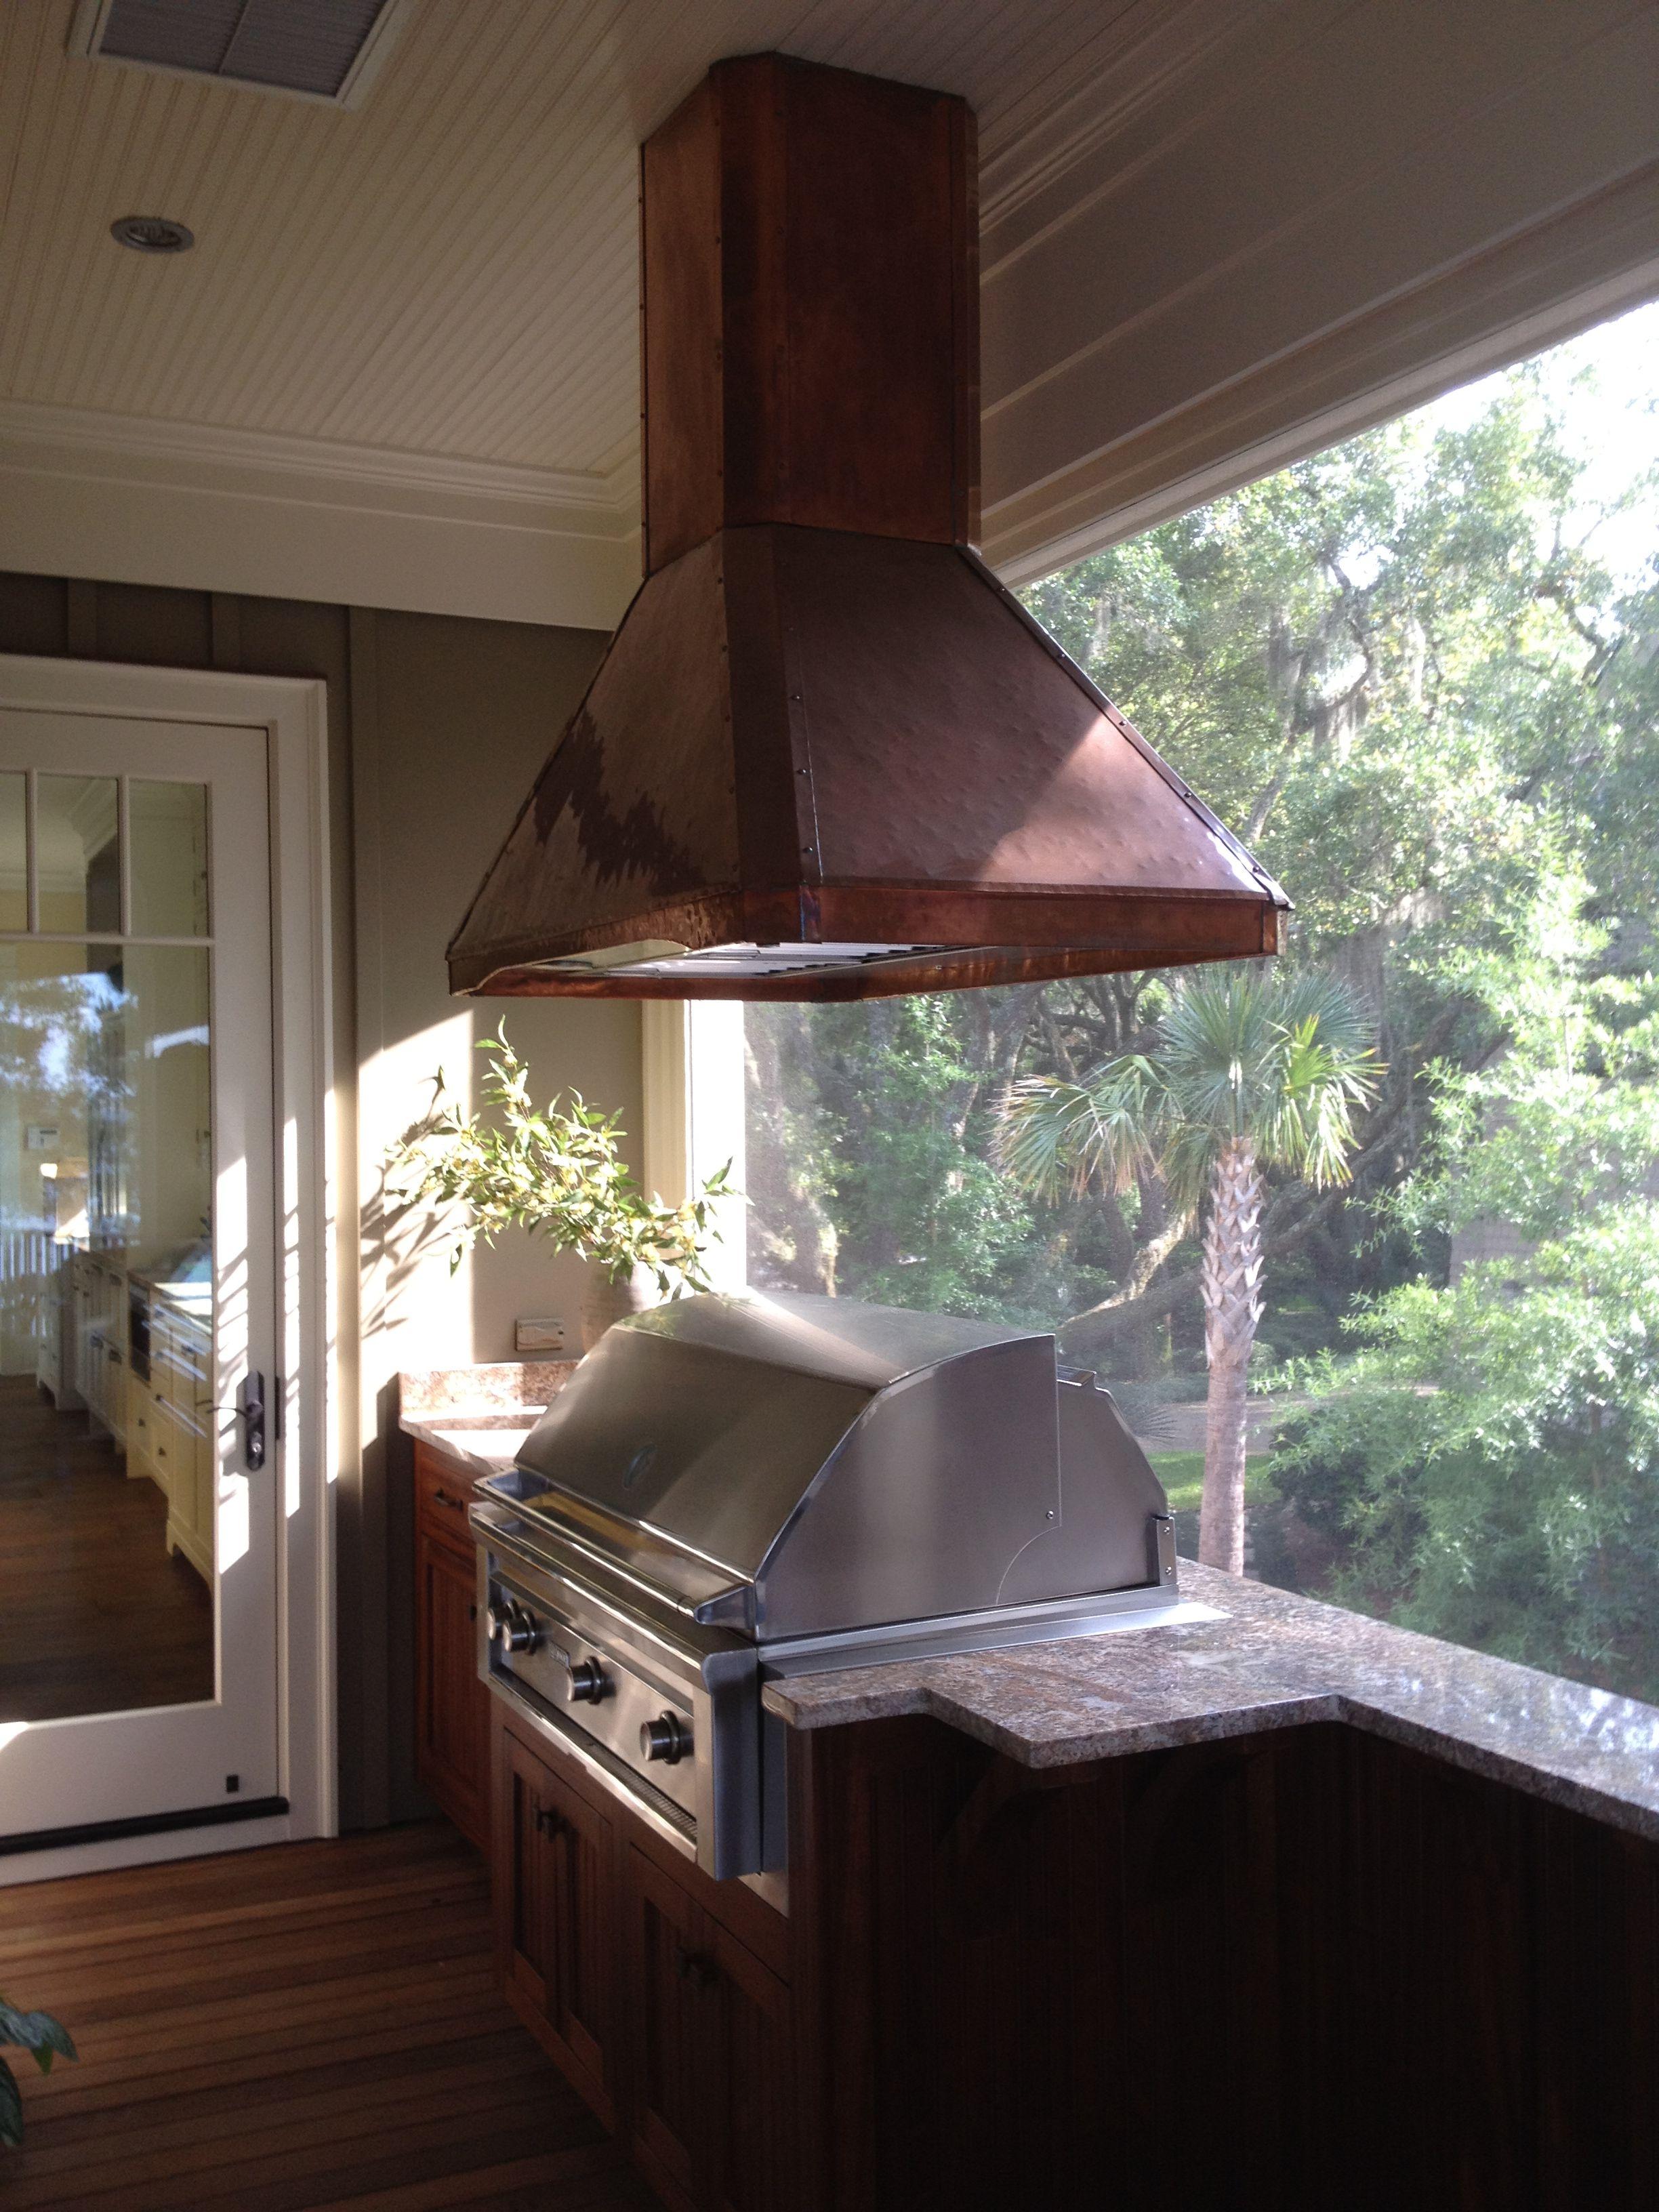 copper hood vent patio inspiration backyard kitchen outdoor kitchen patio on outdoor kitchen vent hood ideas id=79478